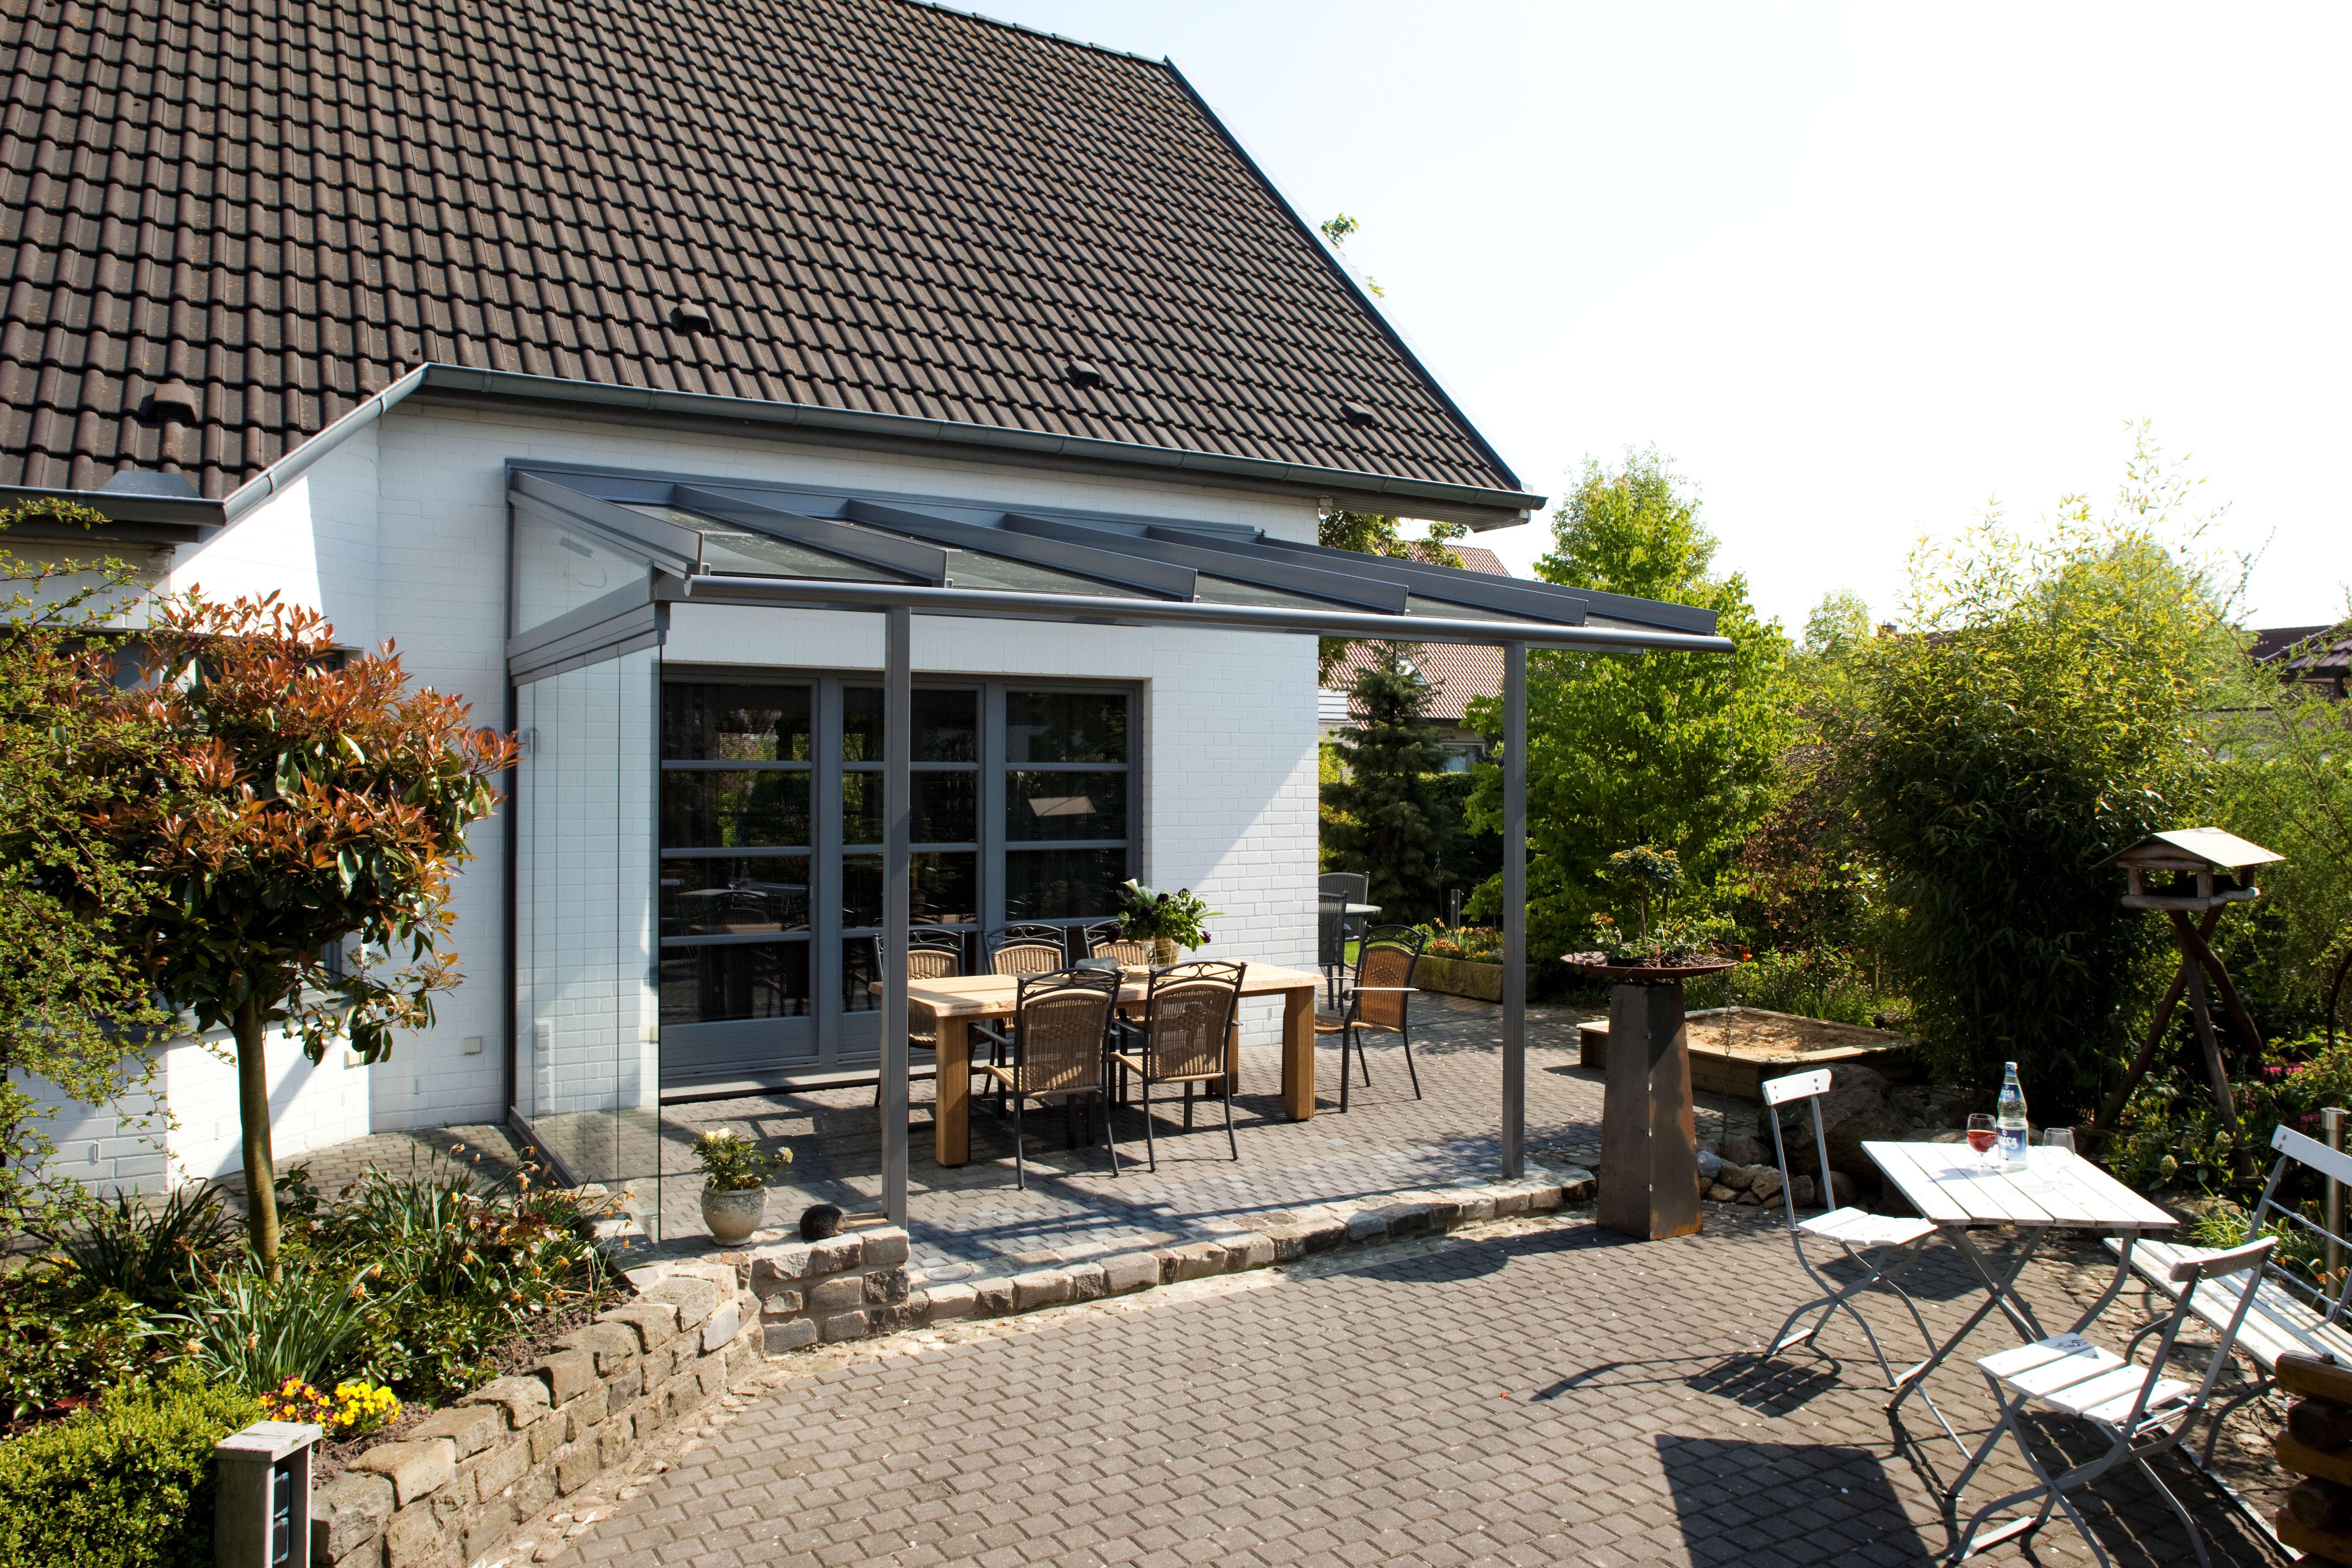 Veranda Ouverte Sur Terrasse Francephotostourisme Fr